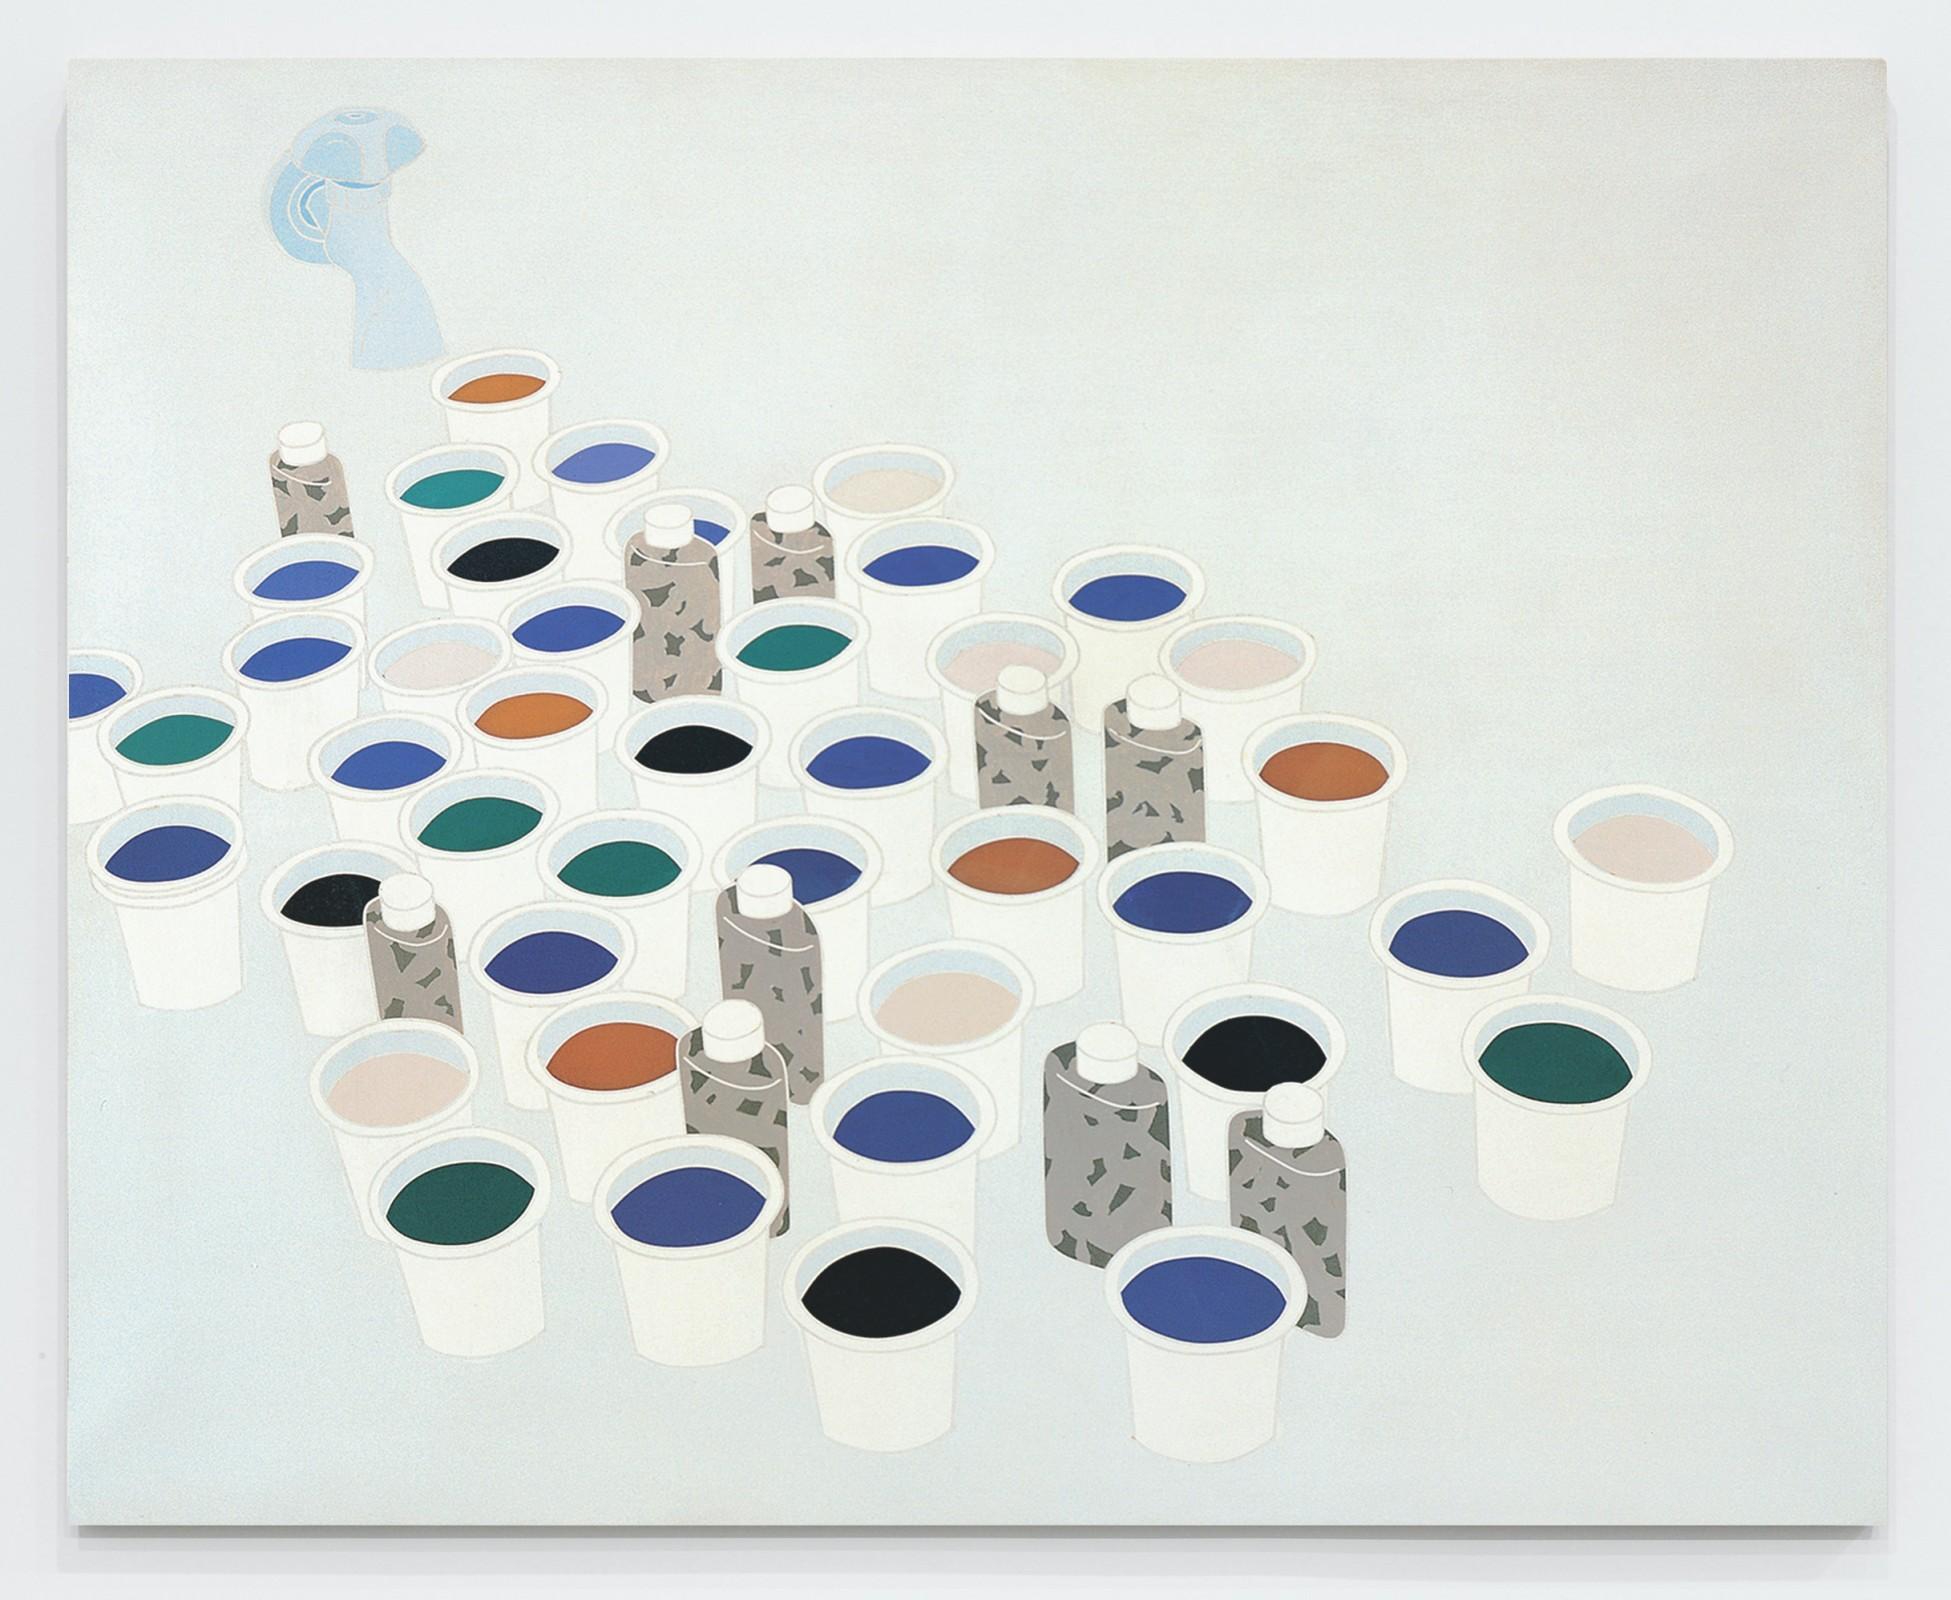 "<span class=""link fancybox-details-link""><a href=""/exhibitions/553/works/artworks_standalone11002/"">View Detail Page</a></span><div class=""artist""><span class=""artist""><strong>EMILIO TADINI</strong></span></div><div class=""title""><em>Paesaggio nello studio. Color & Co. / Landscape in the Studio</em>, 1970</div><div class=""medium"">Acrylic on canvas</div><div class=""dimensions""><div class=""dimensions"">51 1/8 x 63 inches</div><div class=""dimensions"">(130 x 160 cm)</div></div><div class=""price price_unavailable"">Sold</div>"